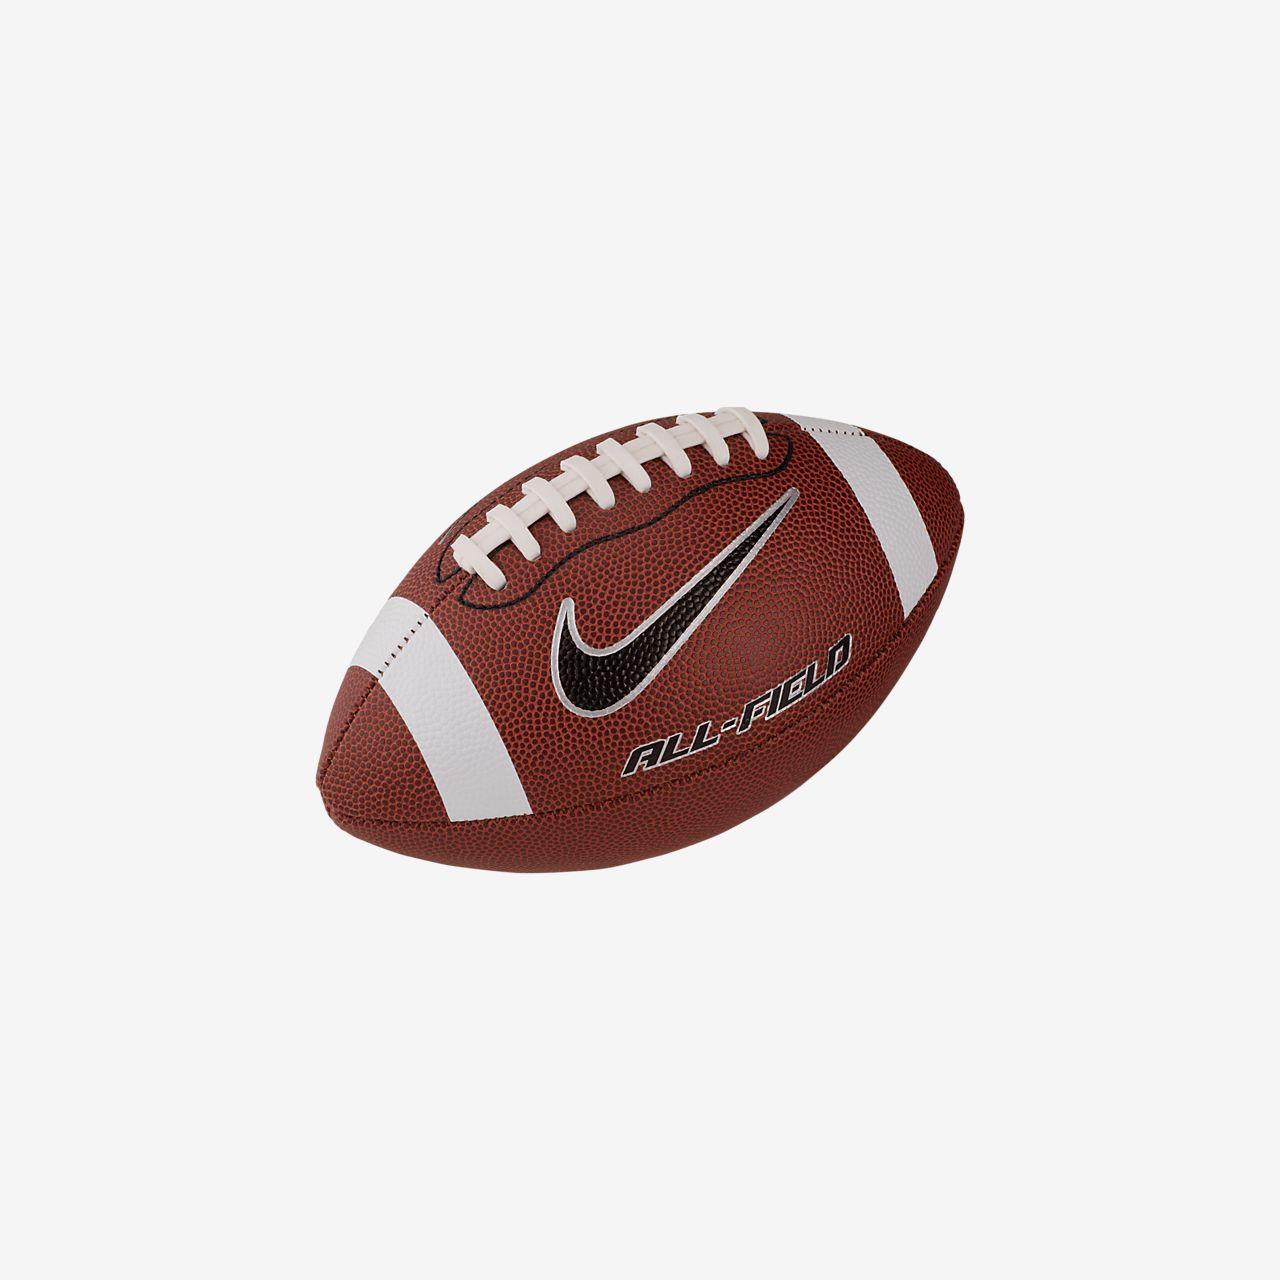 Ballon de football américain Nike All-Field 3.0